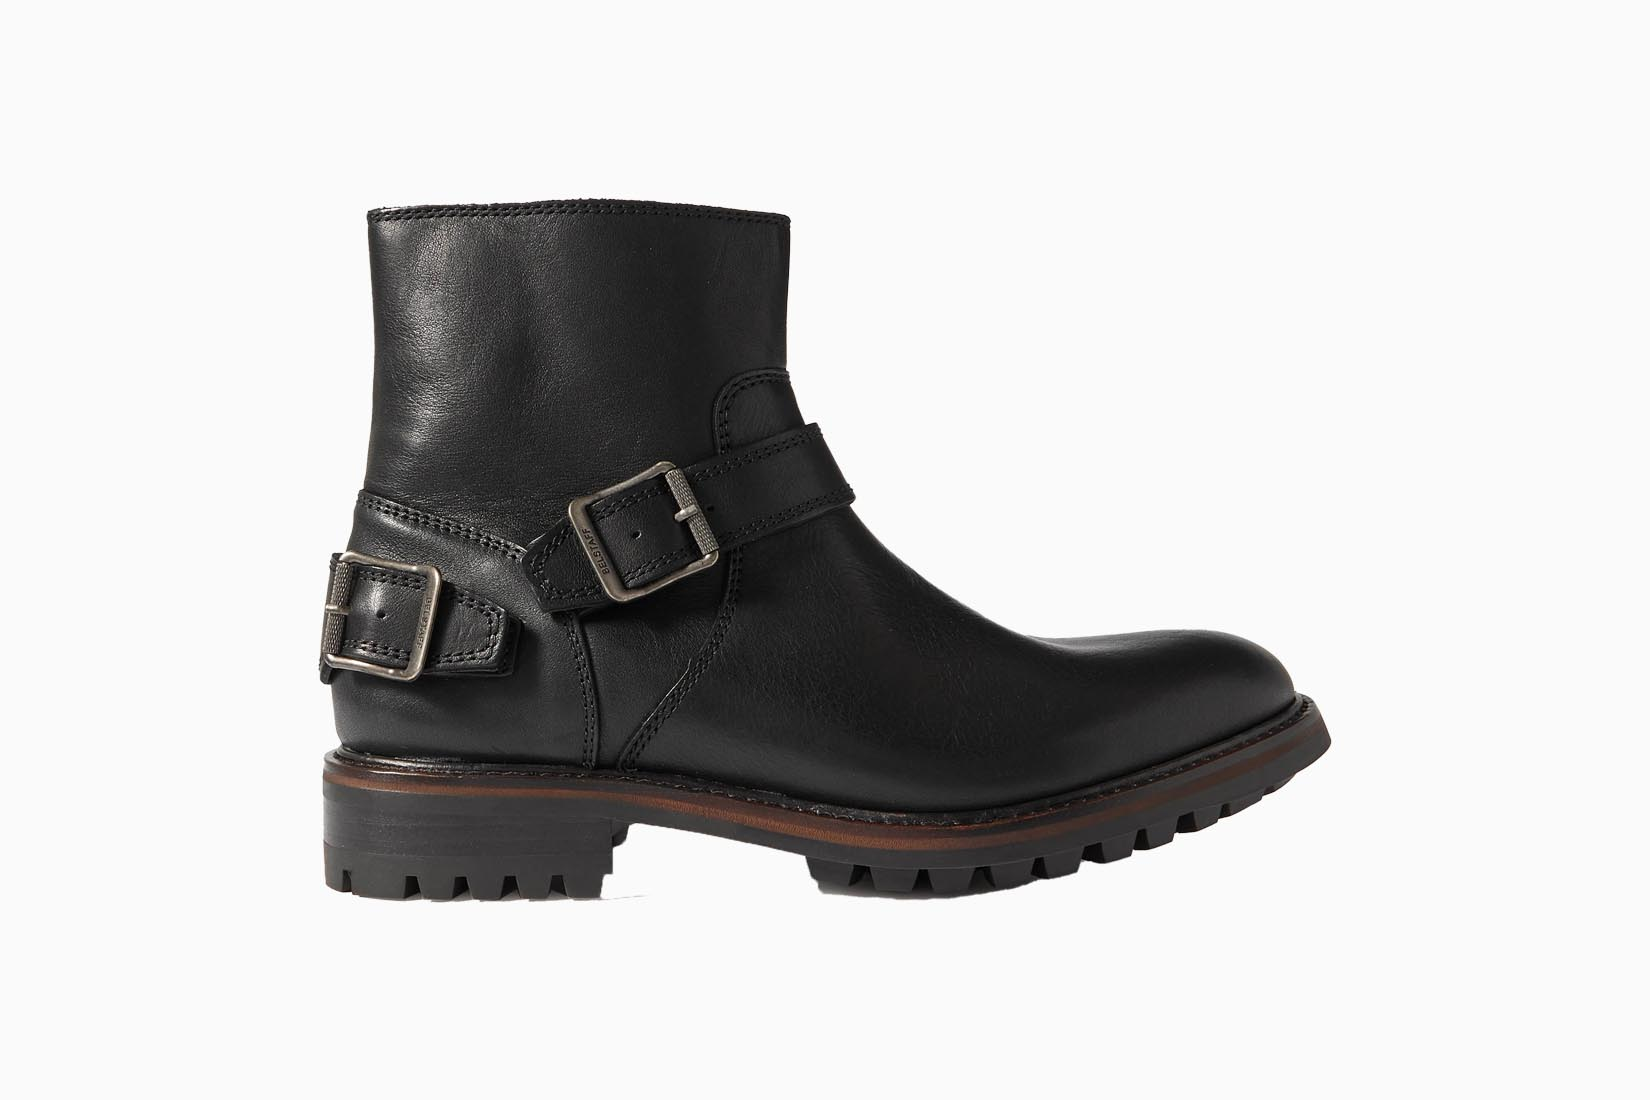 best boots men belstaff trialmaster leather boots review Luxe Digital